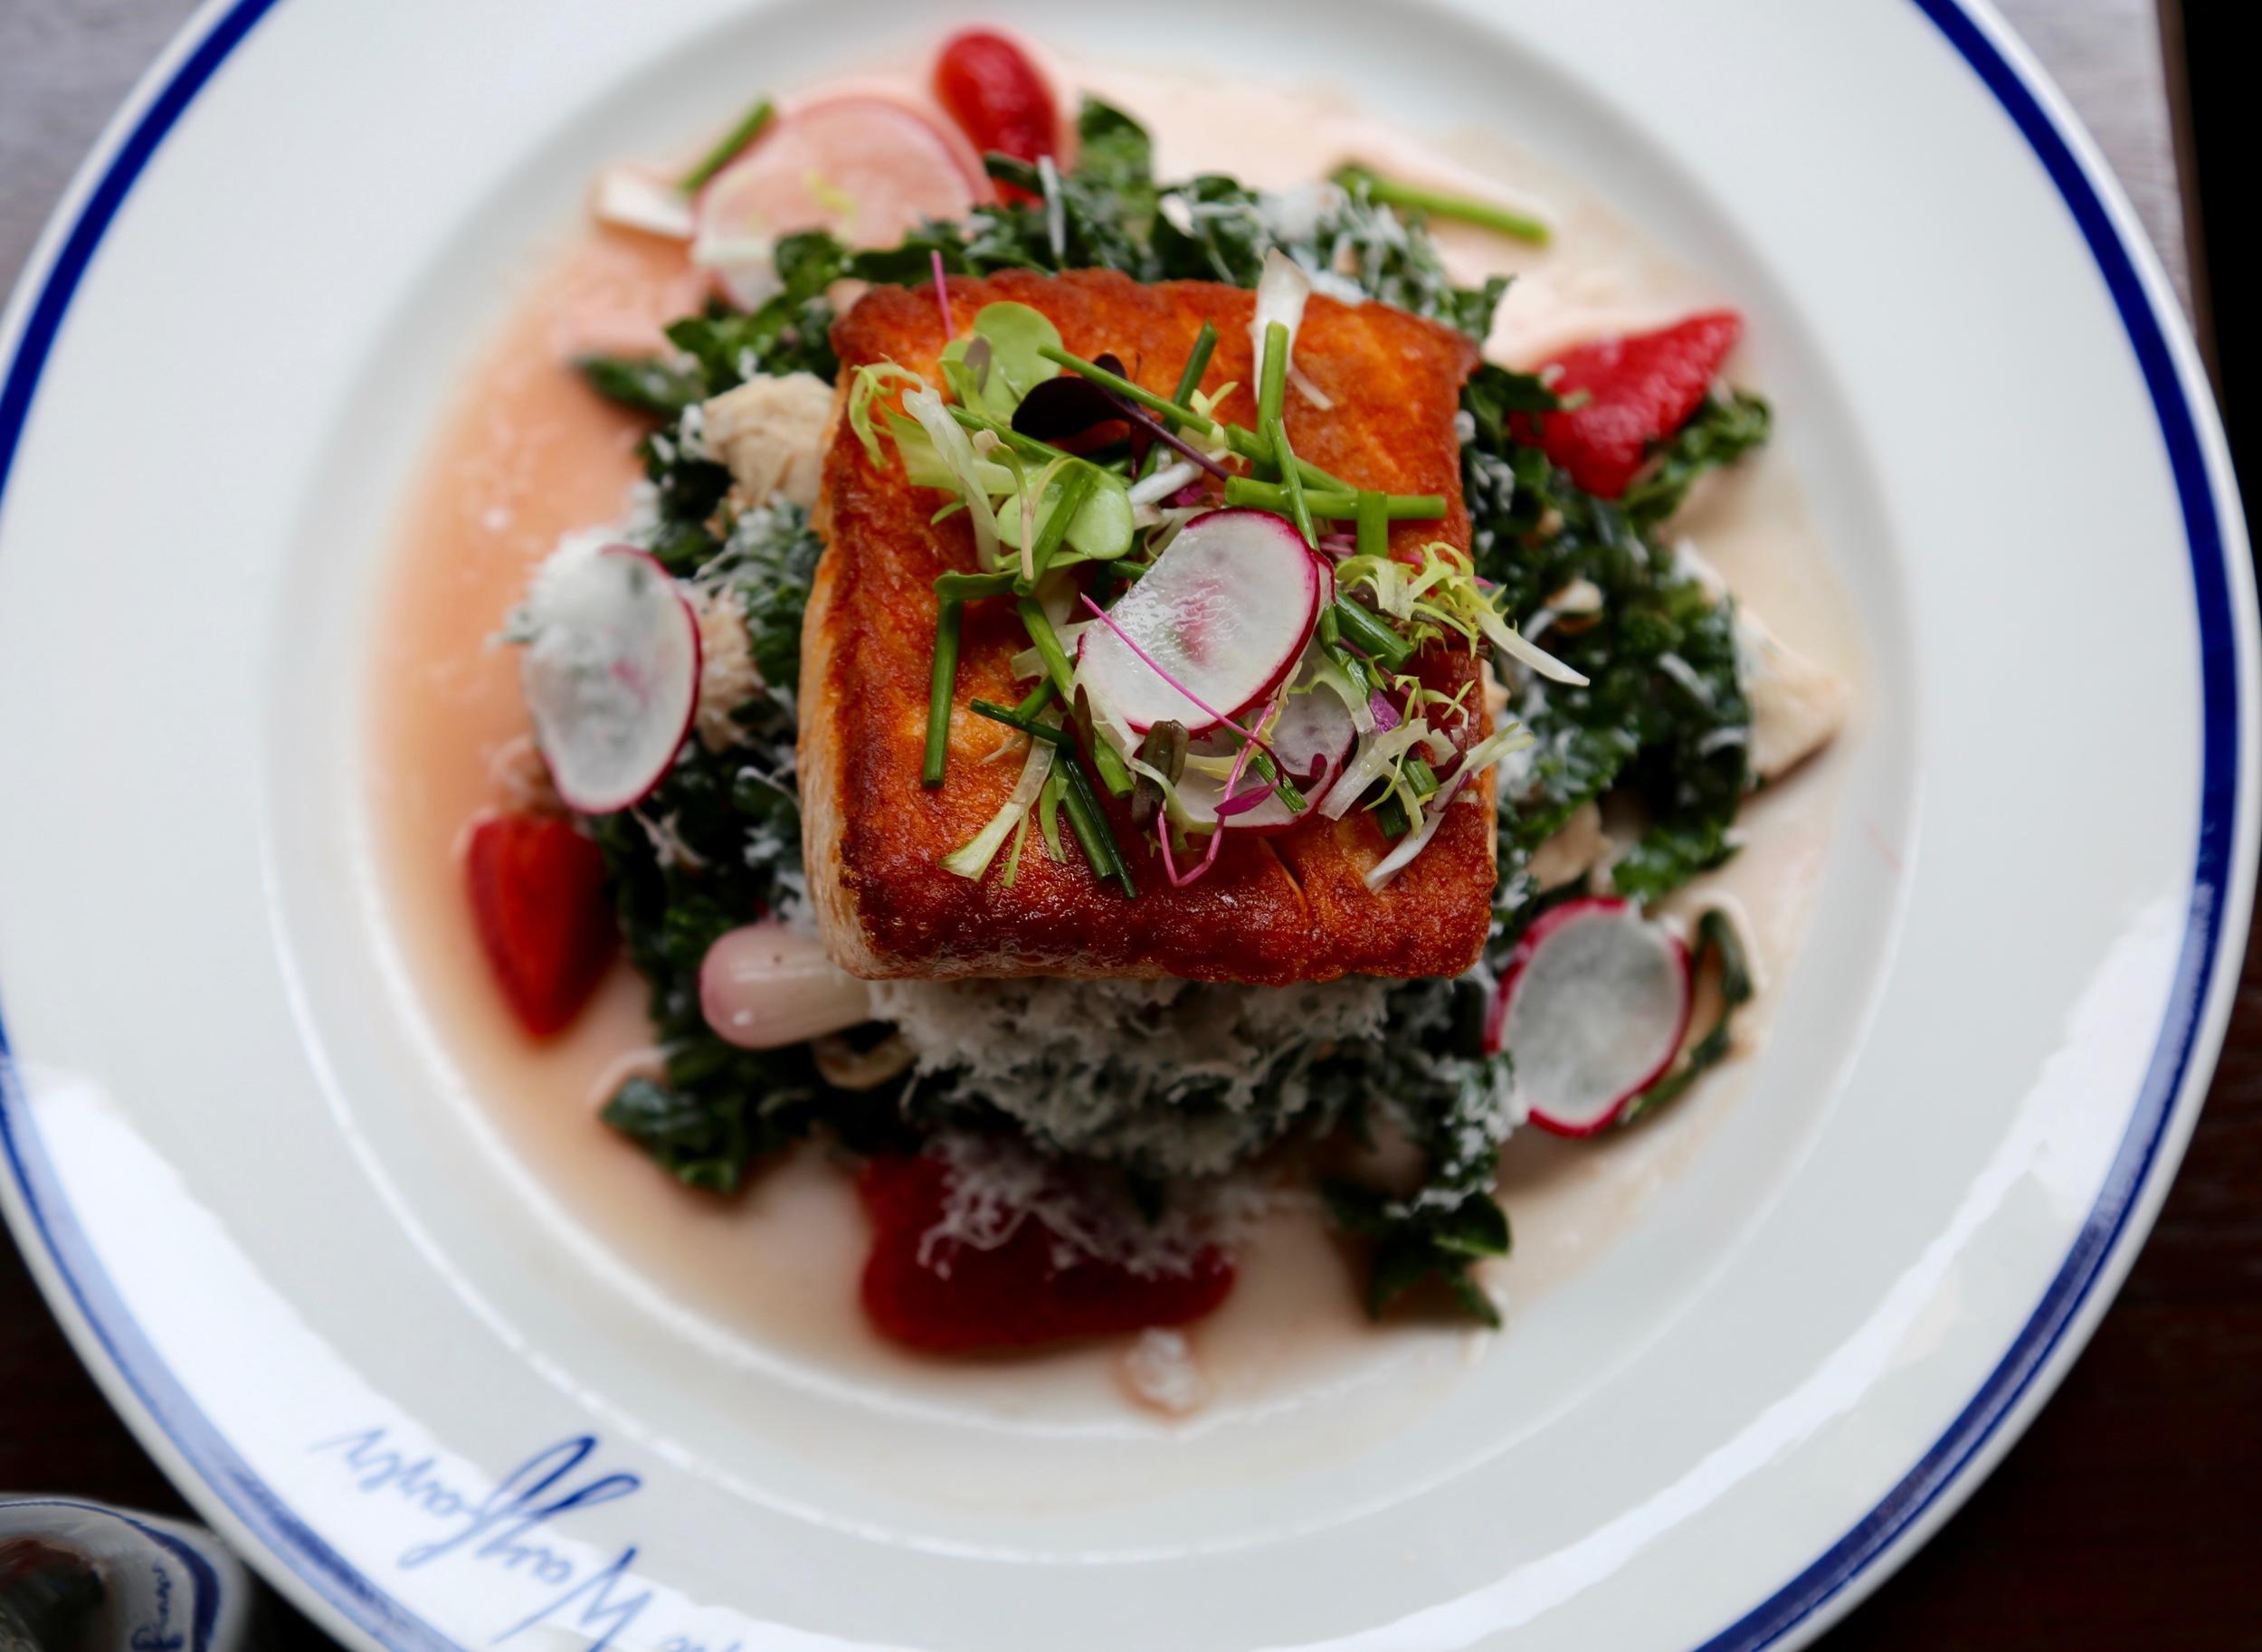 kale salad with salmon